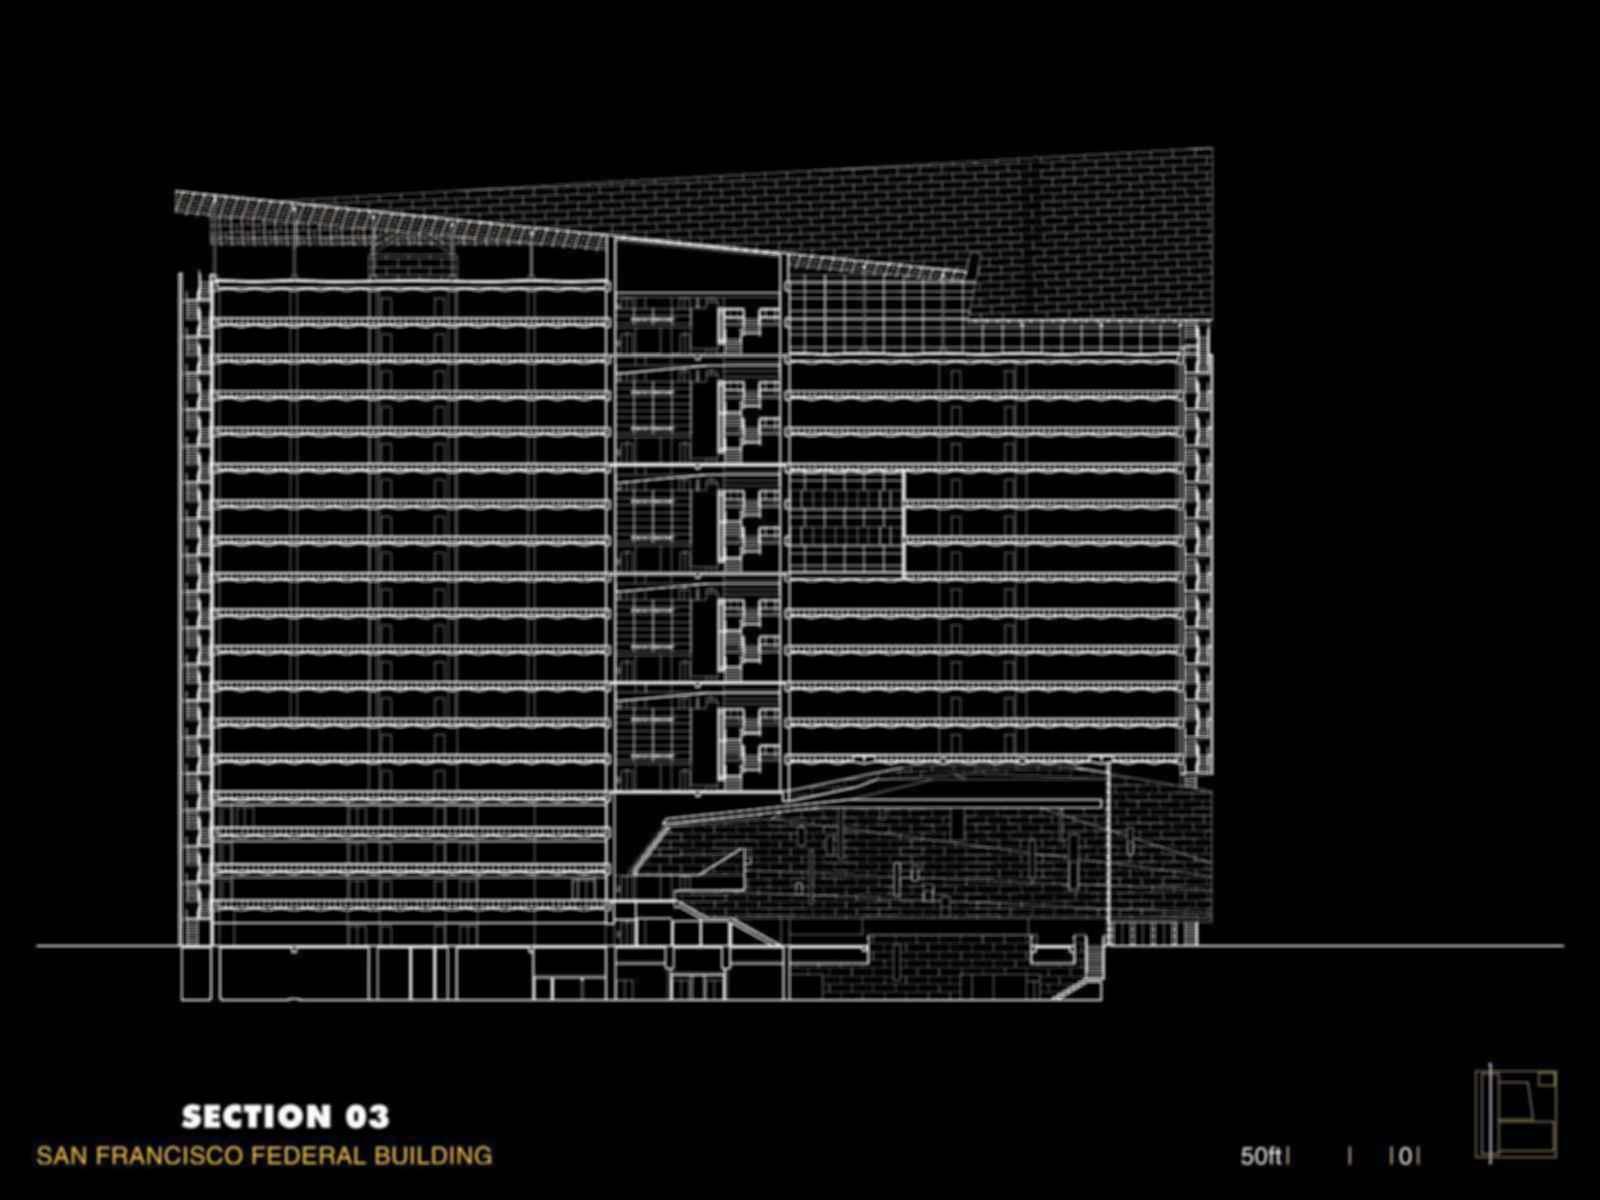 San Francisco Federal Building - Concept Design